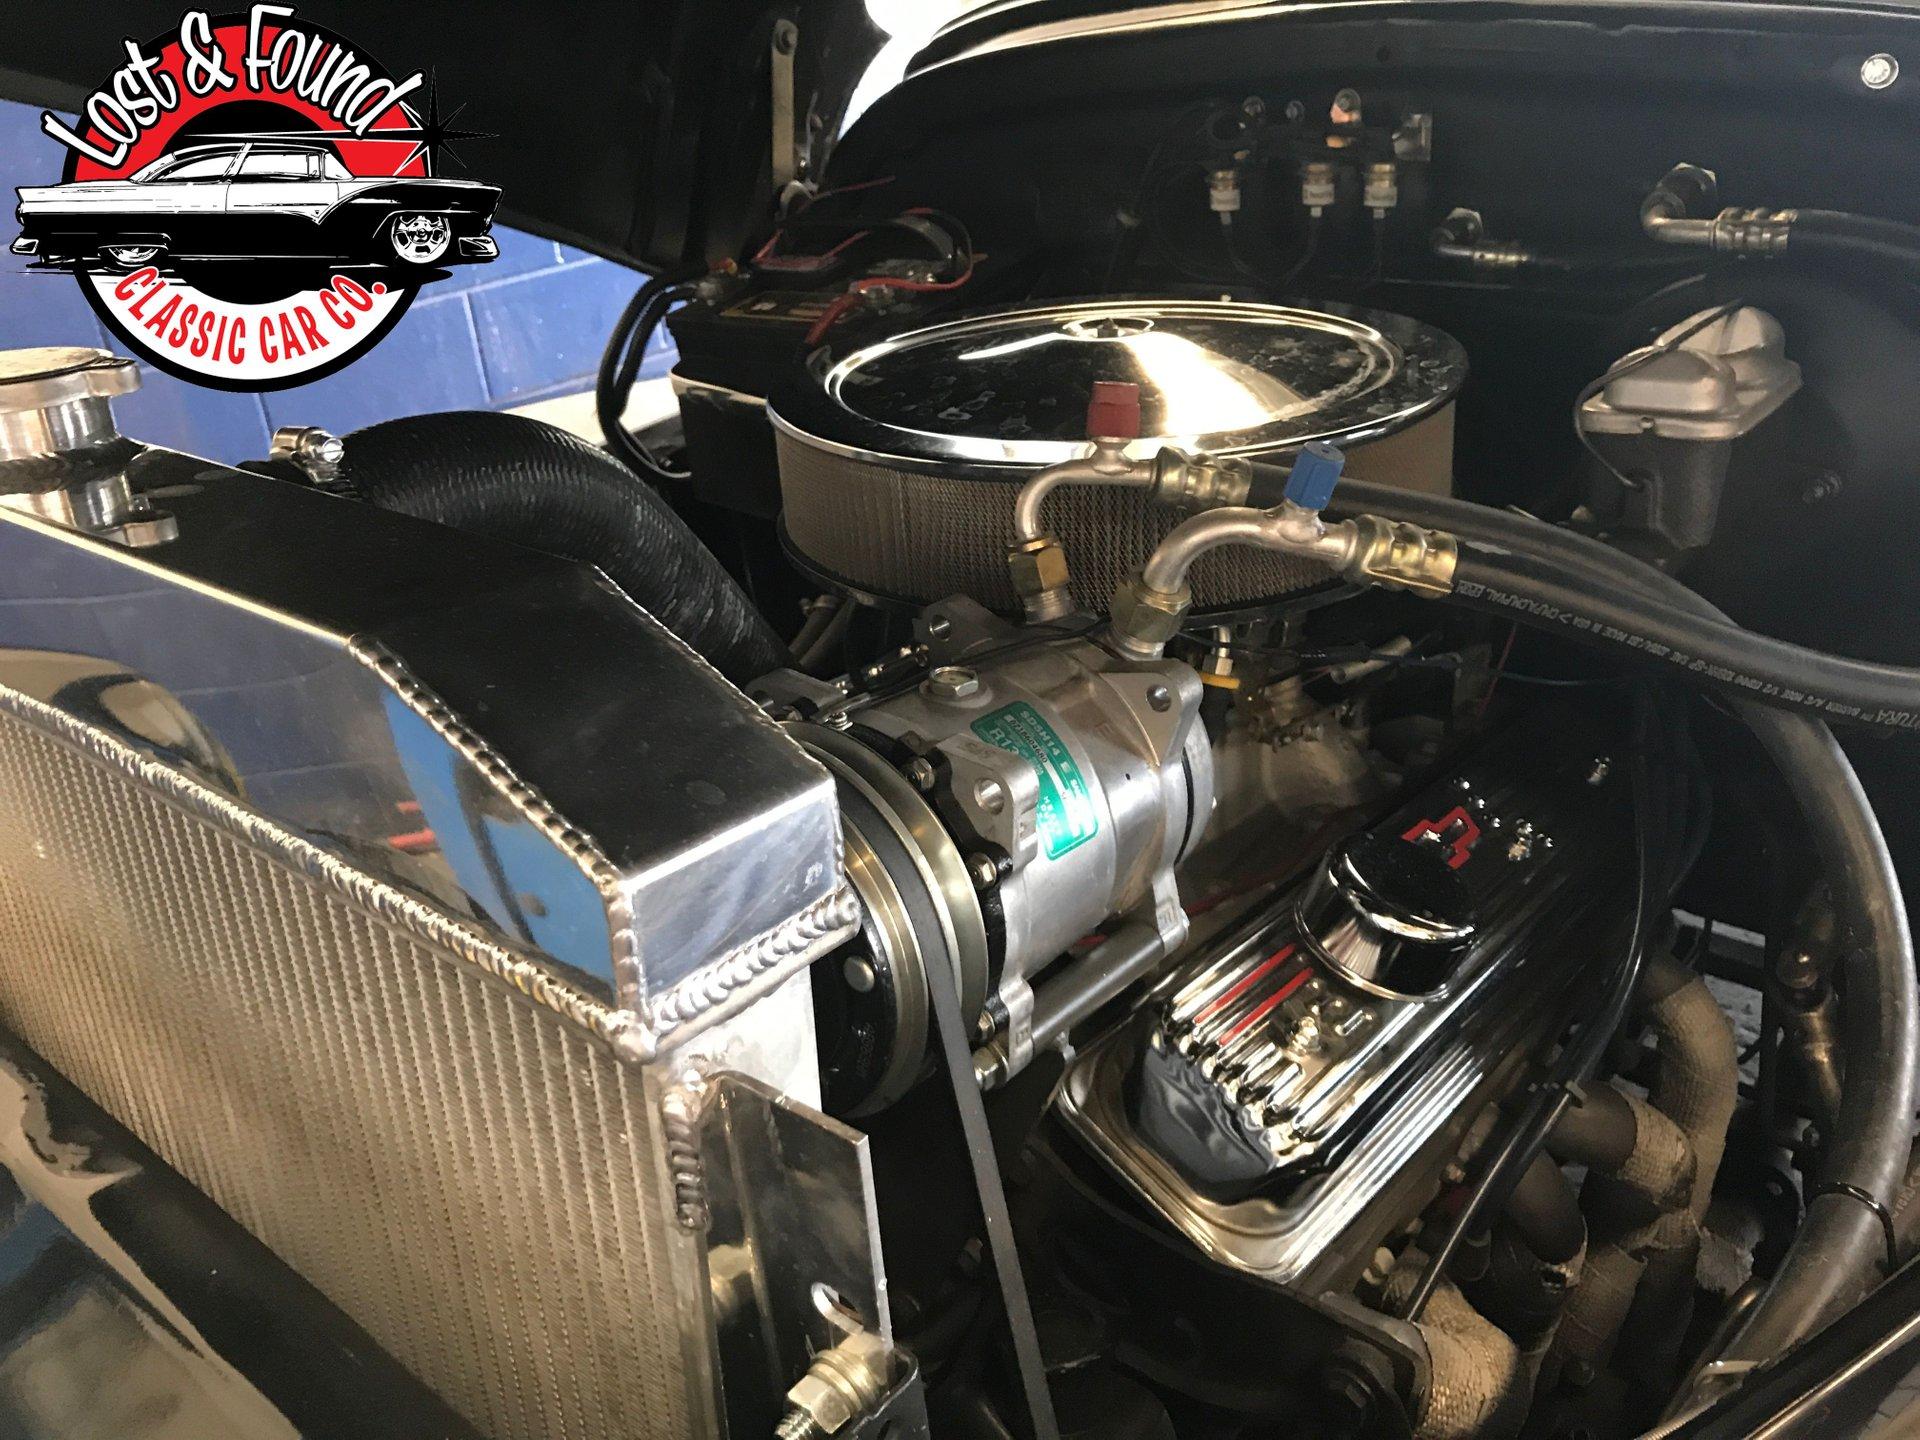 1948 Chevrolet Sedan Delivery | Lost & Found Classic Car Co